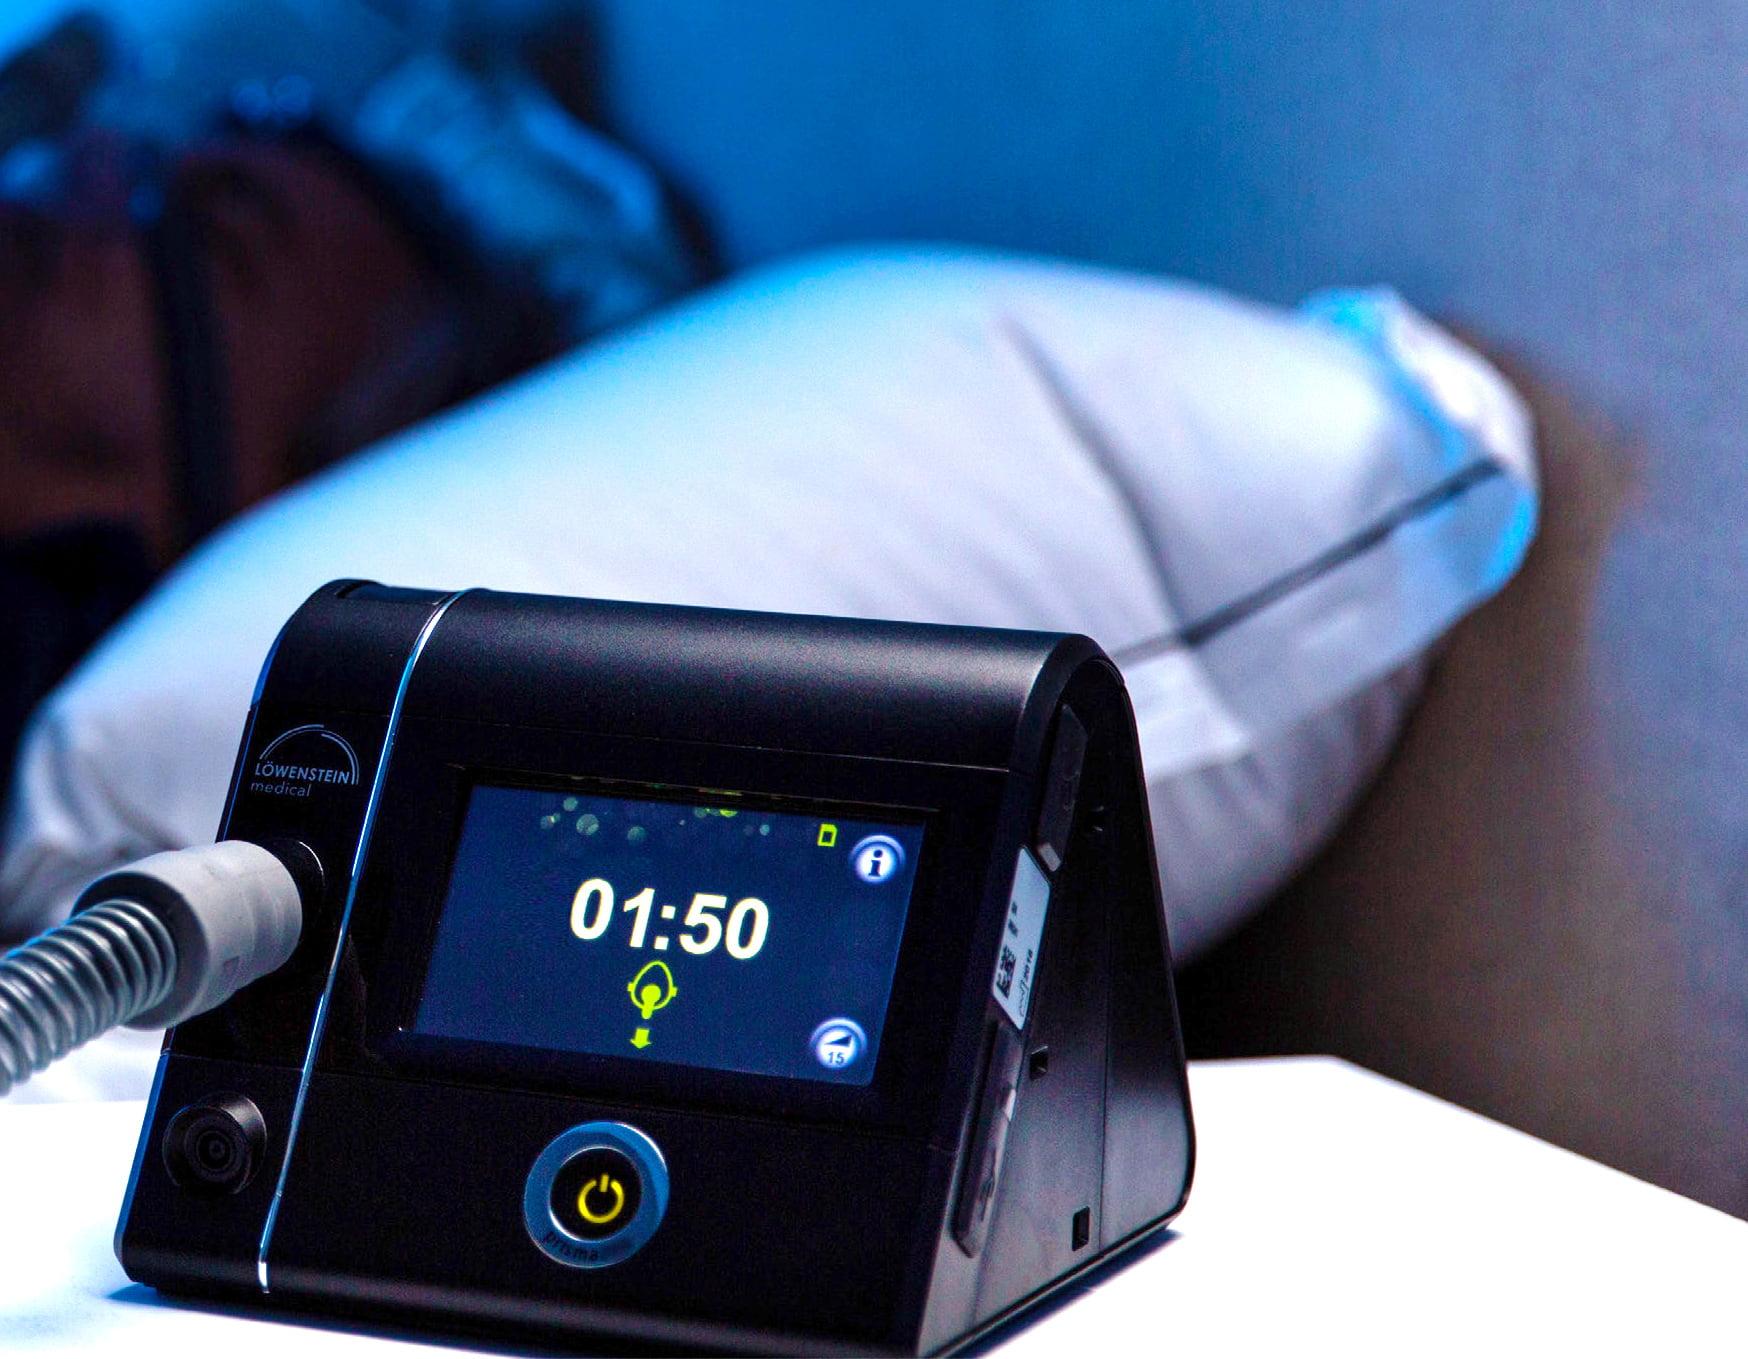 Аппарат для титрации Prisma LAB - в спальне, пациент спит в маске на кровати